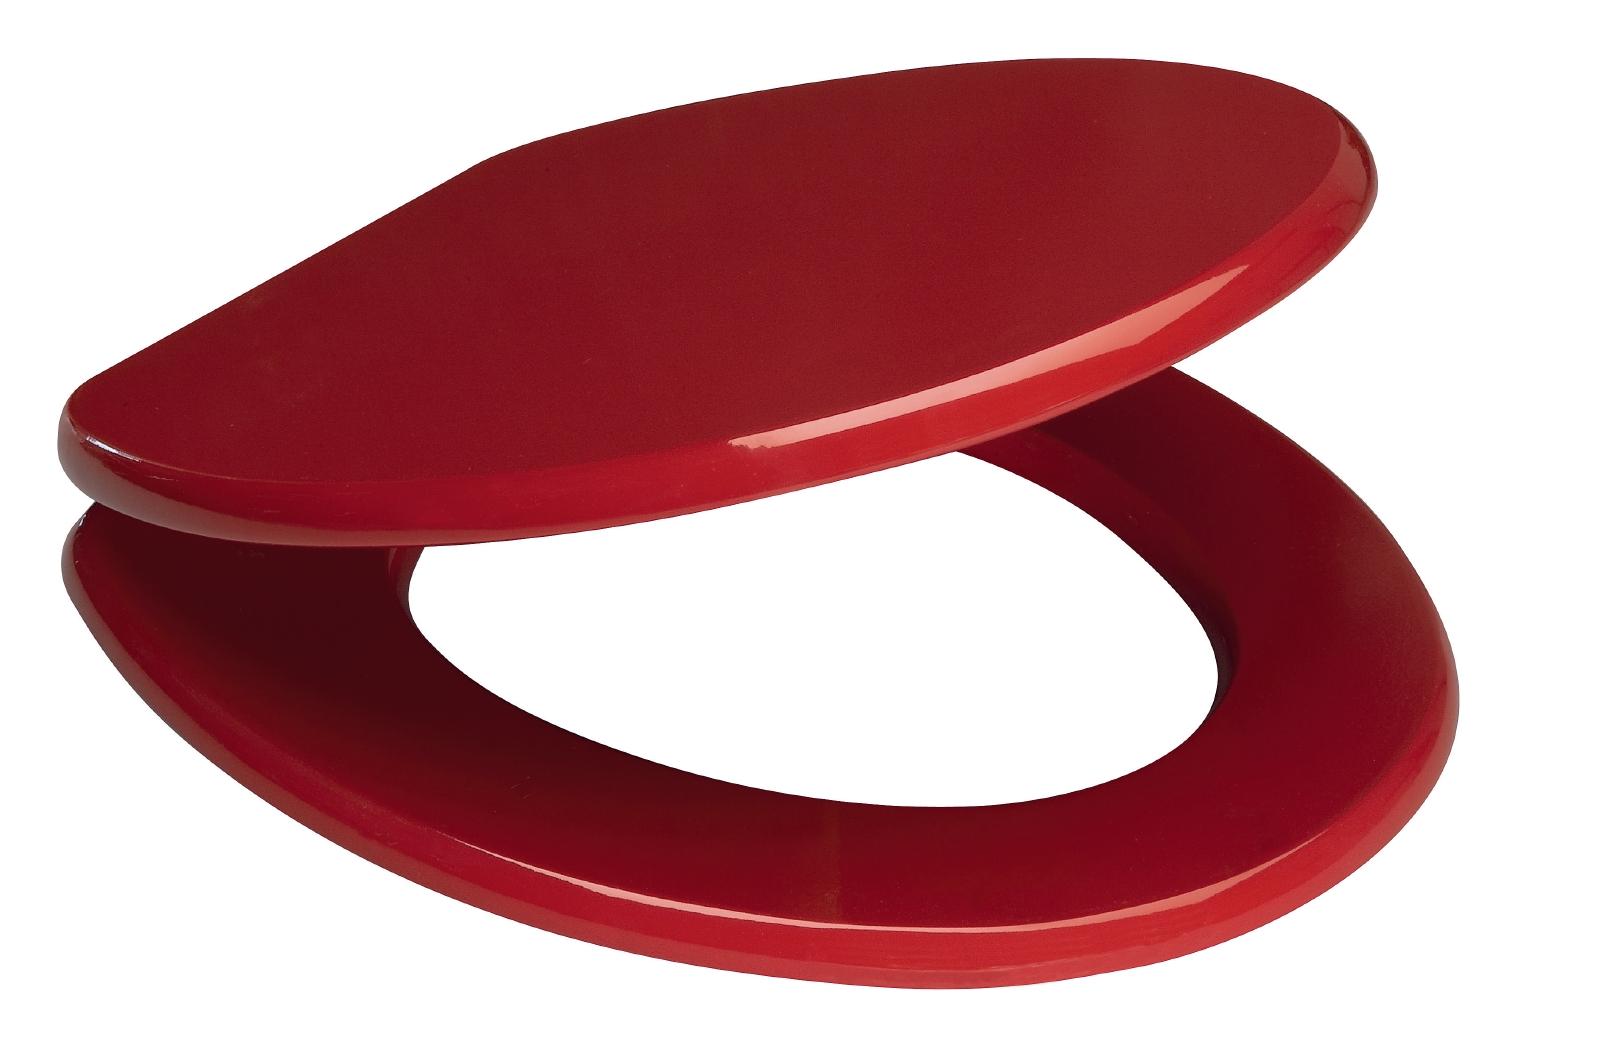 sanitop wingenroth wc sitz venezia rot holzkern ebay. Black Bedroom Furniture Sets. Home Design Ideas